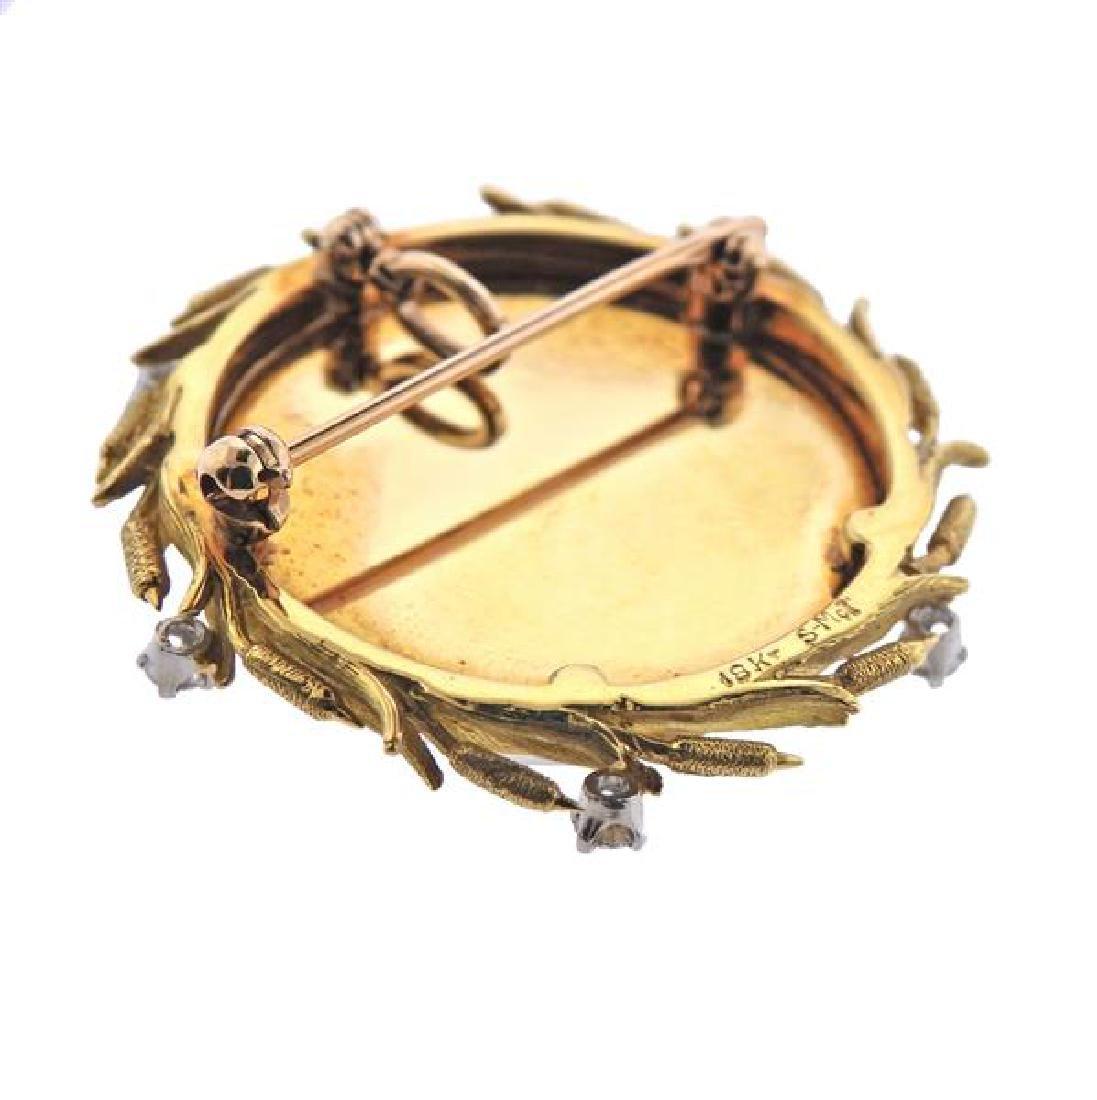 McTeigue 18K Gold Diamond MOP Reverse Painting Brooch - 4